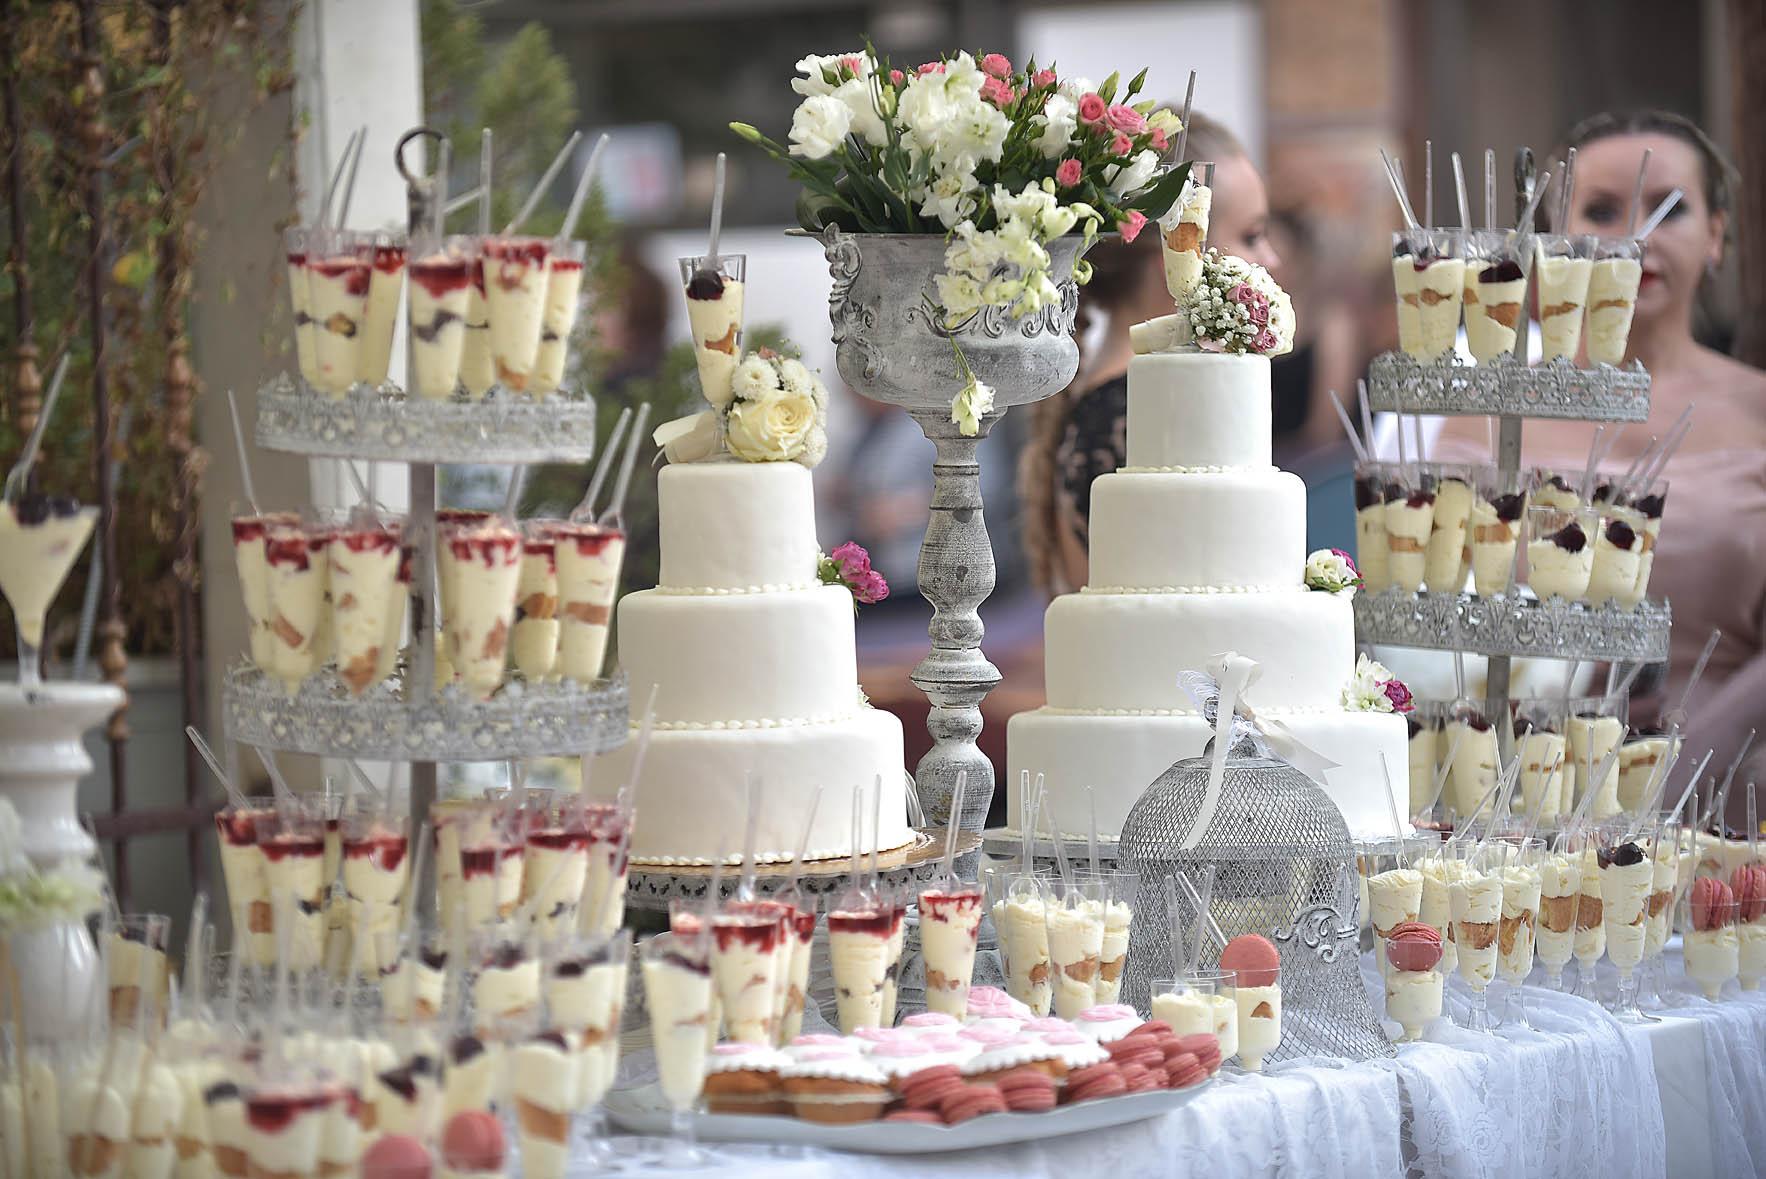 wedding-details-larissa-flowers-sweets